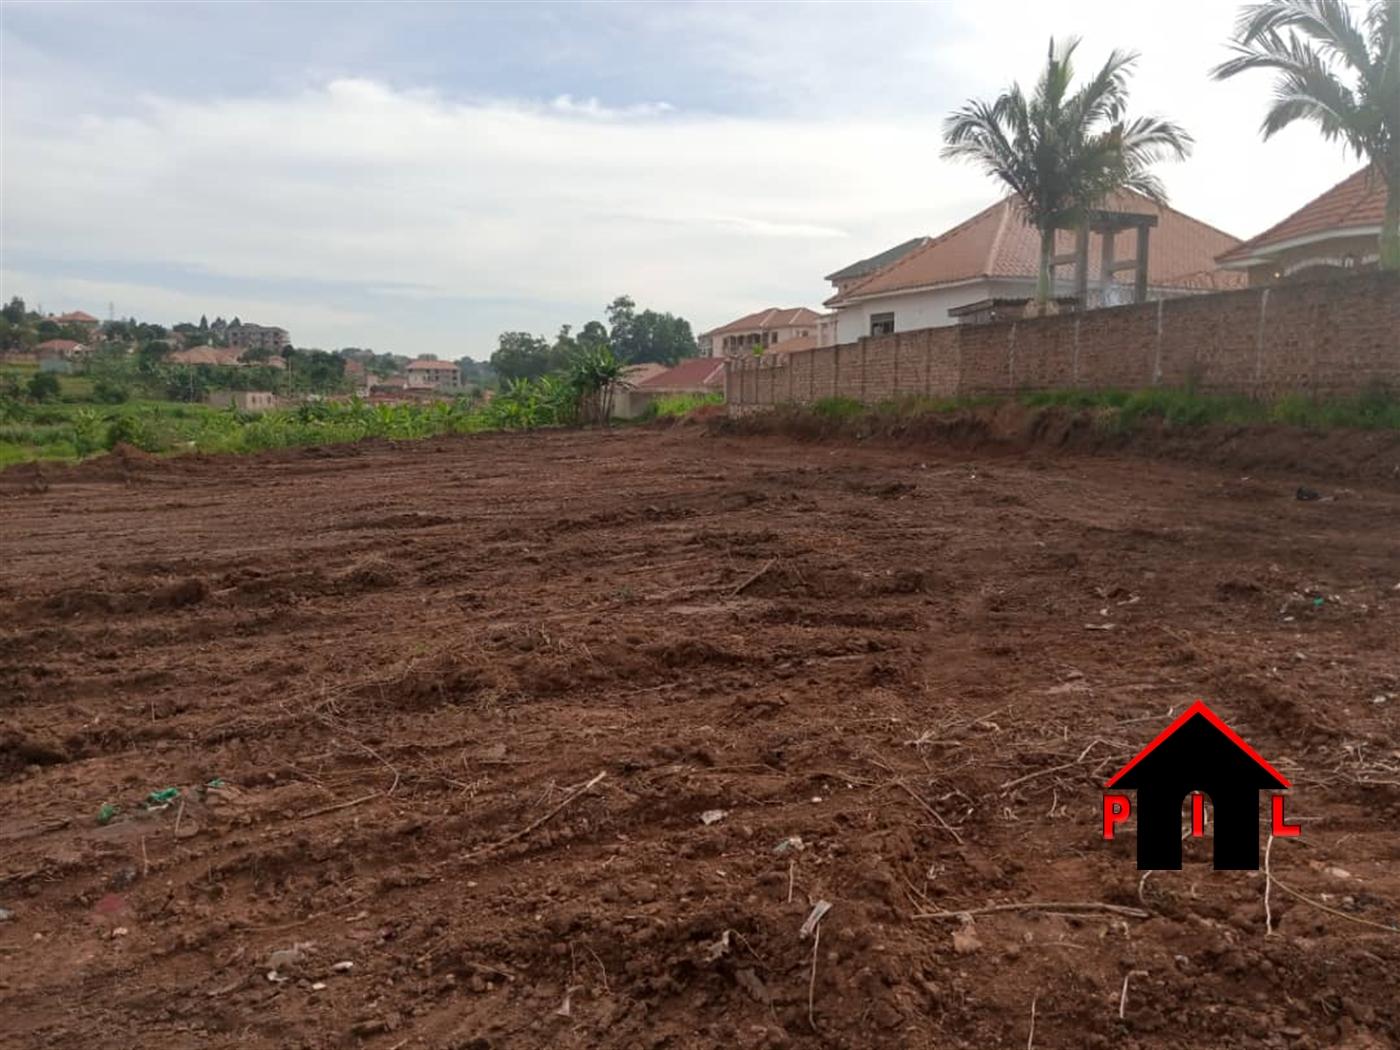 Residential Land for sale in Kyaliwajjala Wakiso